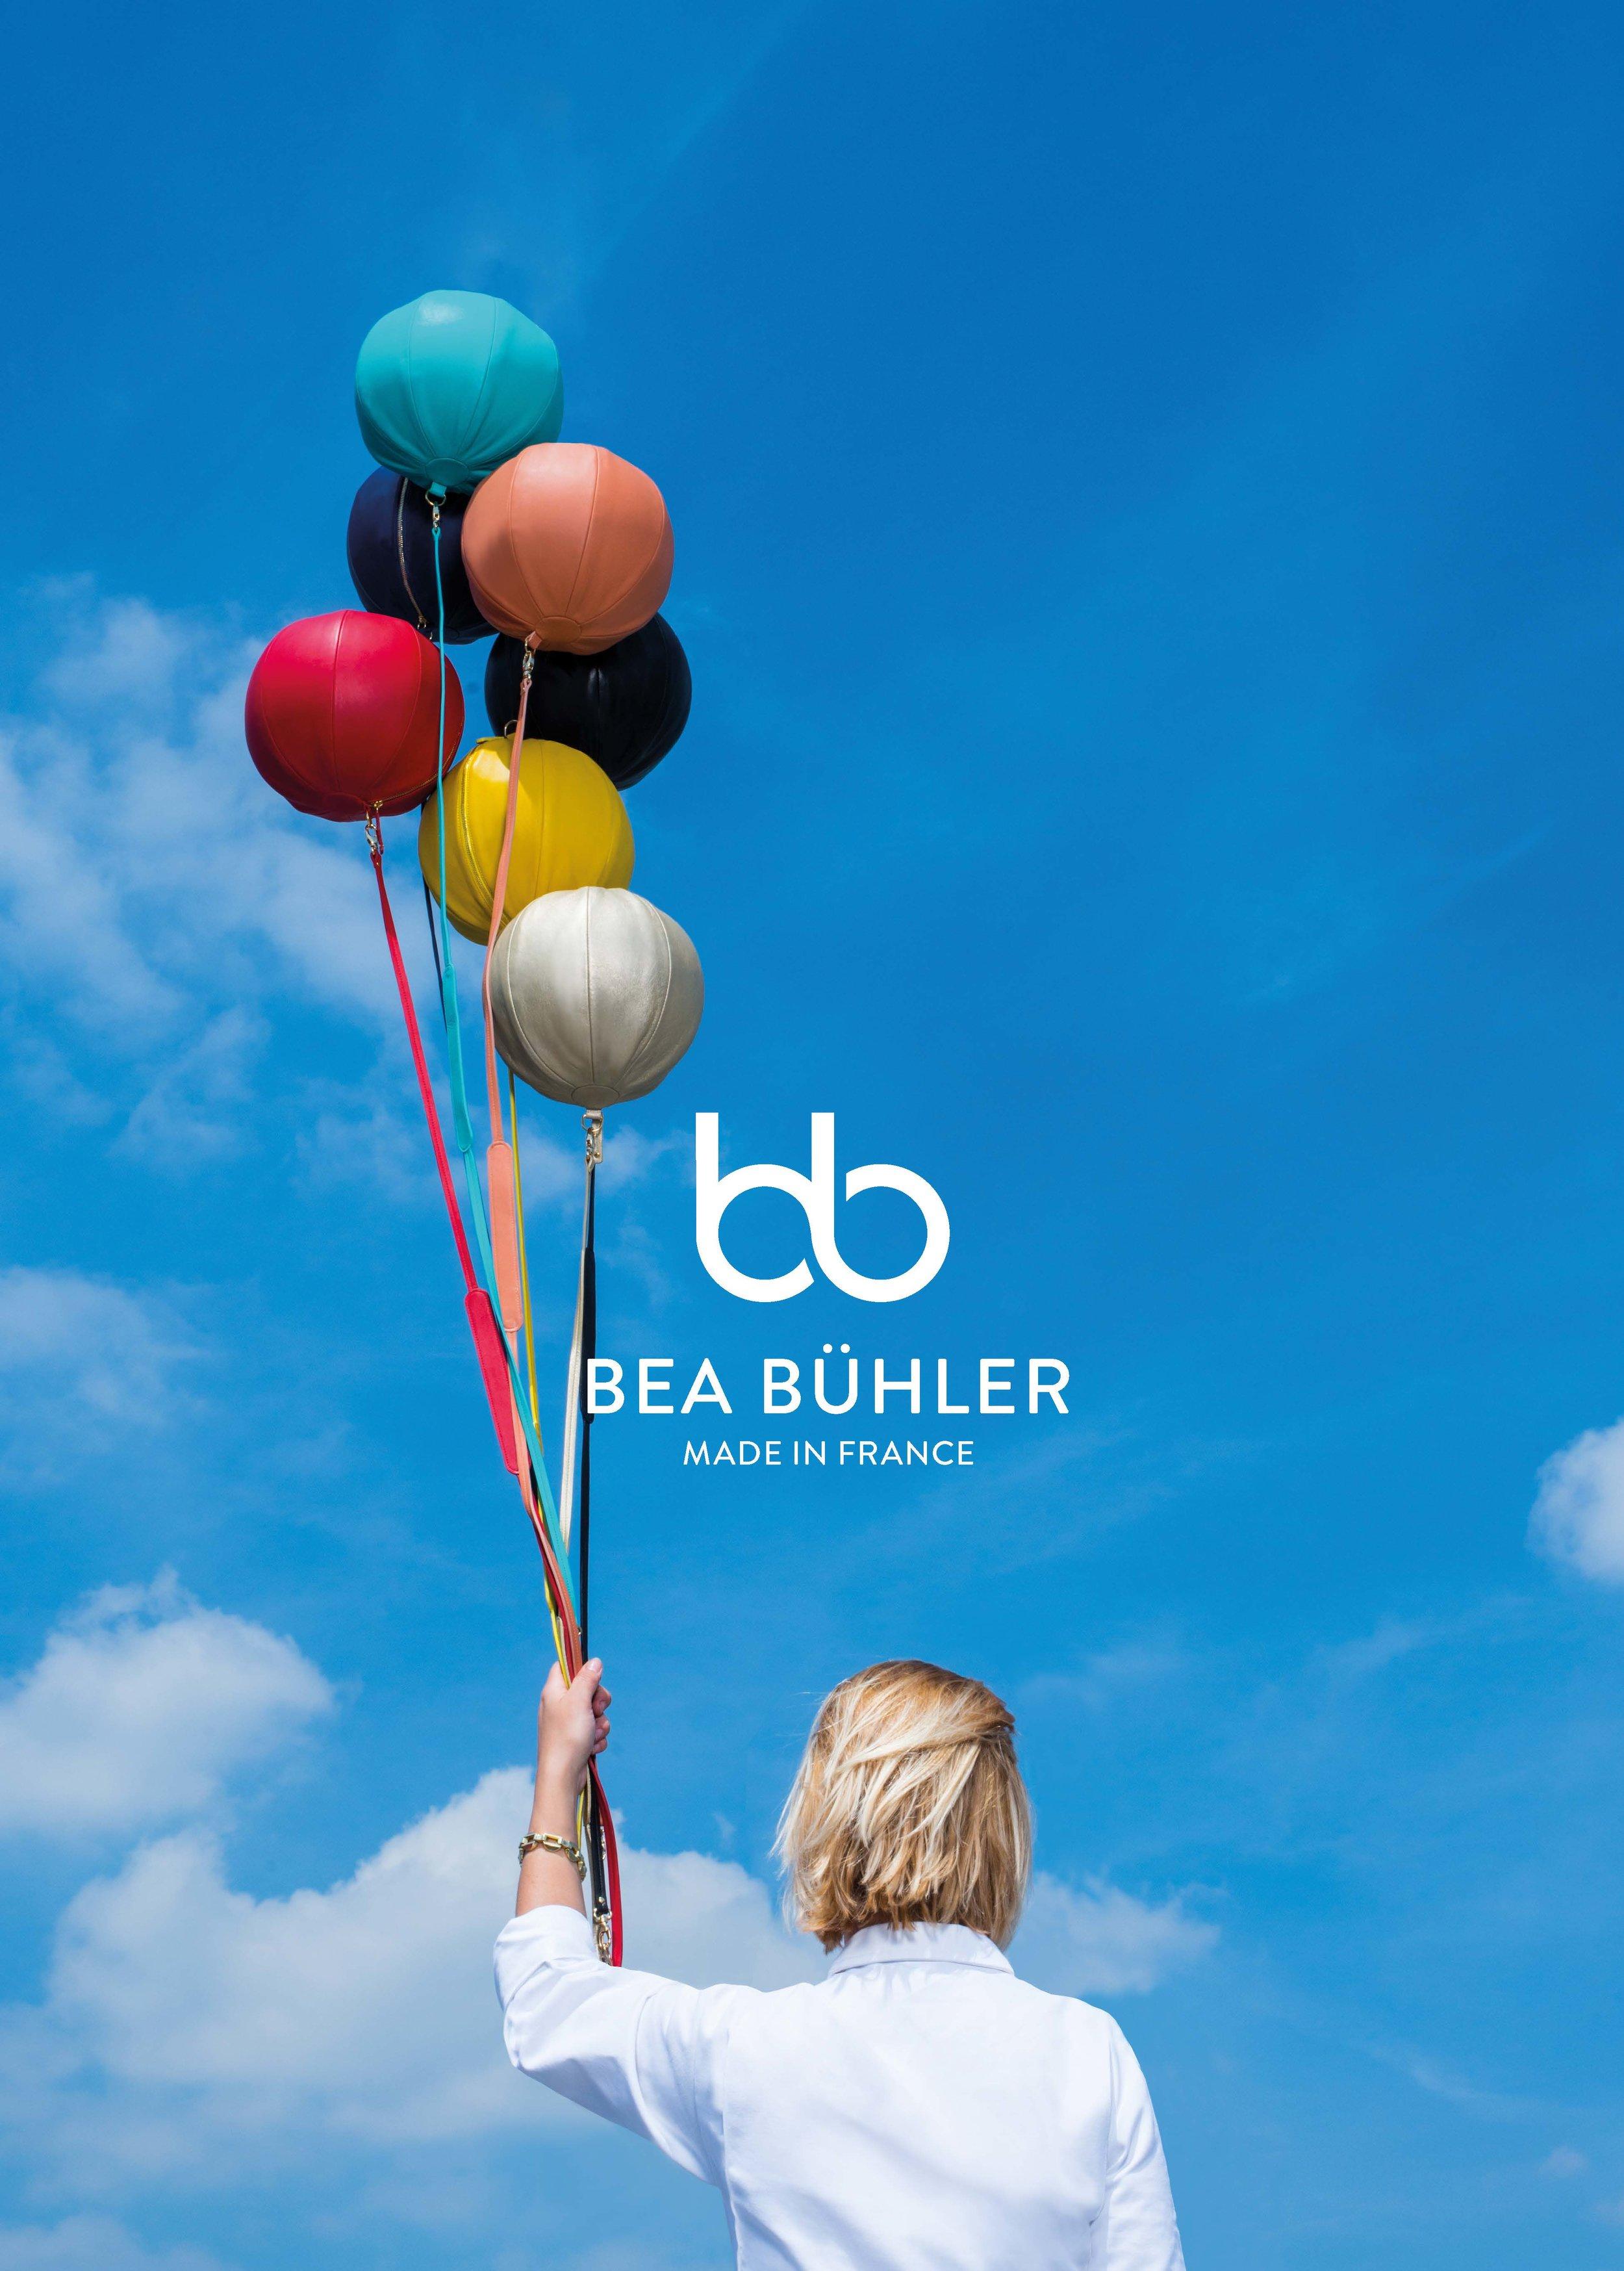 bea_buehler_balloon_bag_made_in_france